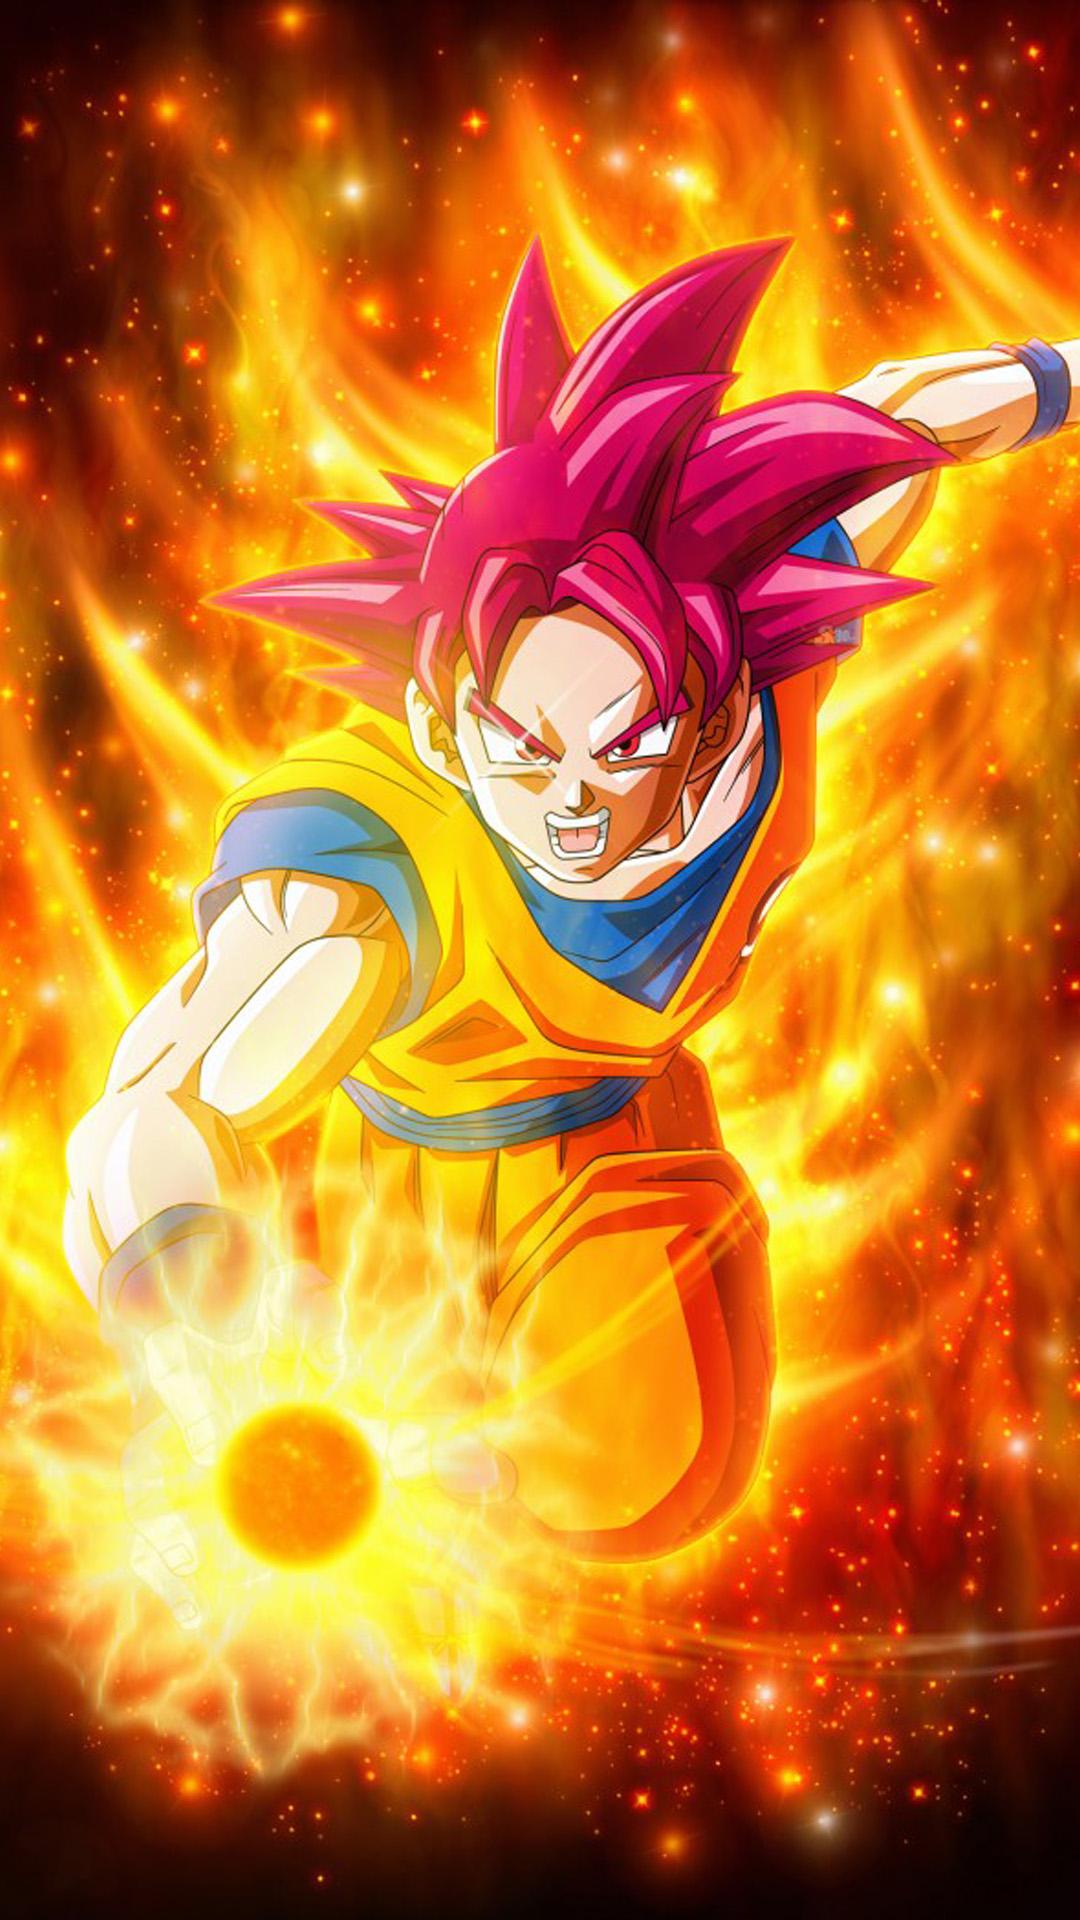 Super Saiyan God In Dragon Ball Super Free 4k Ultra Hd